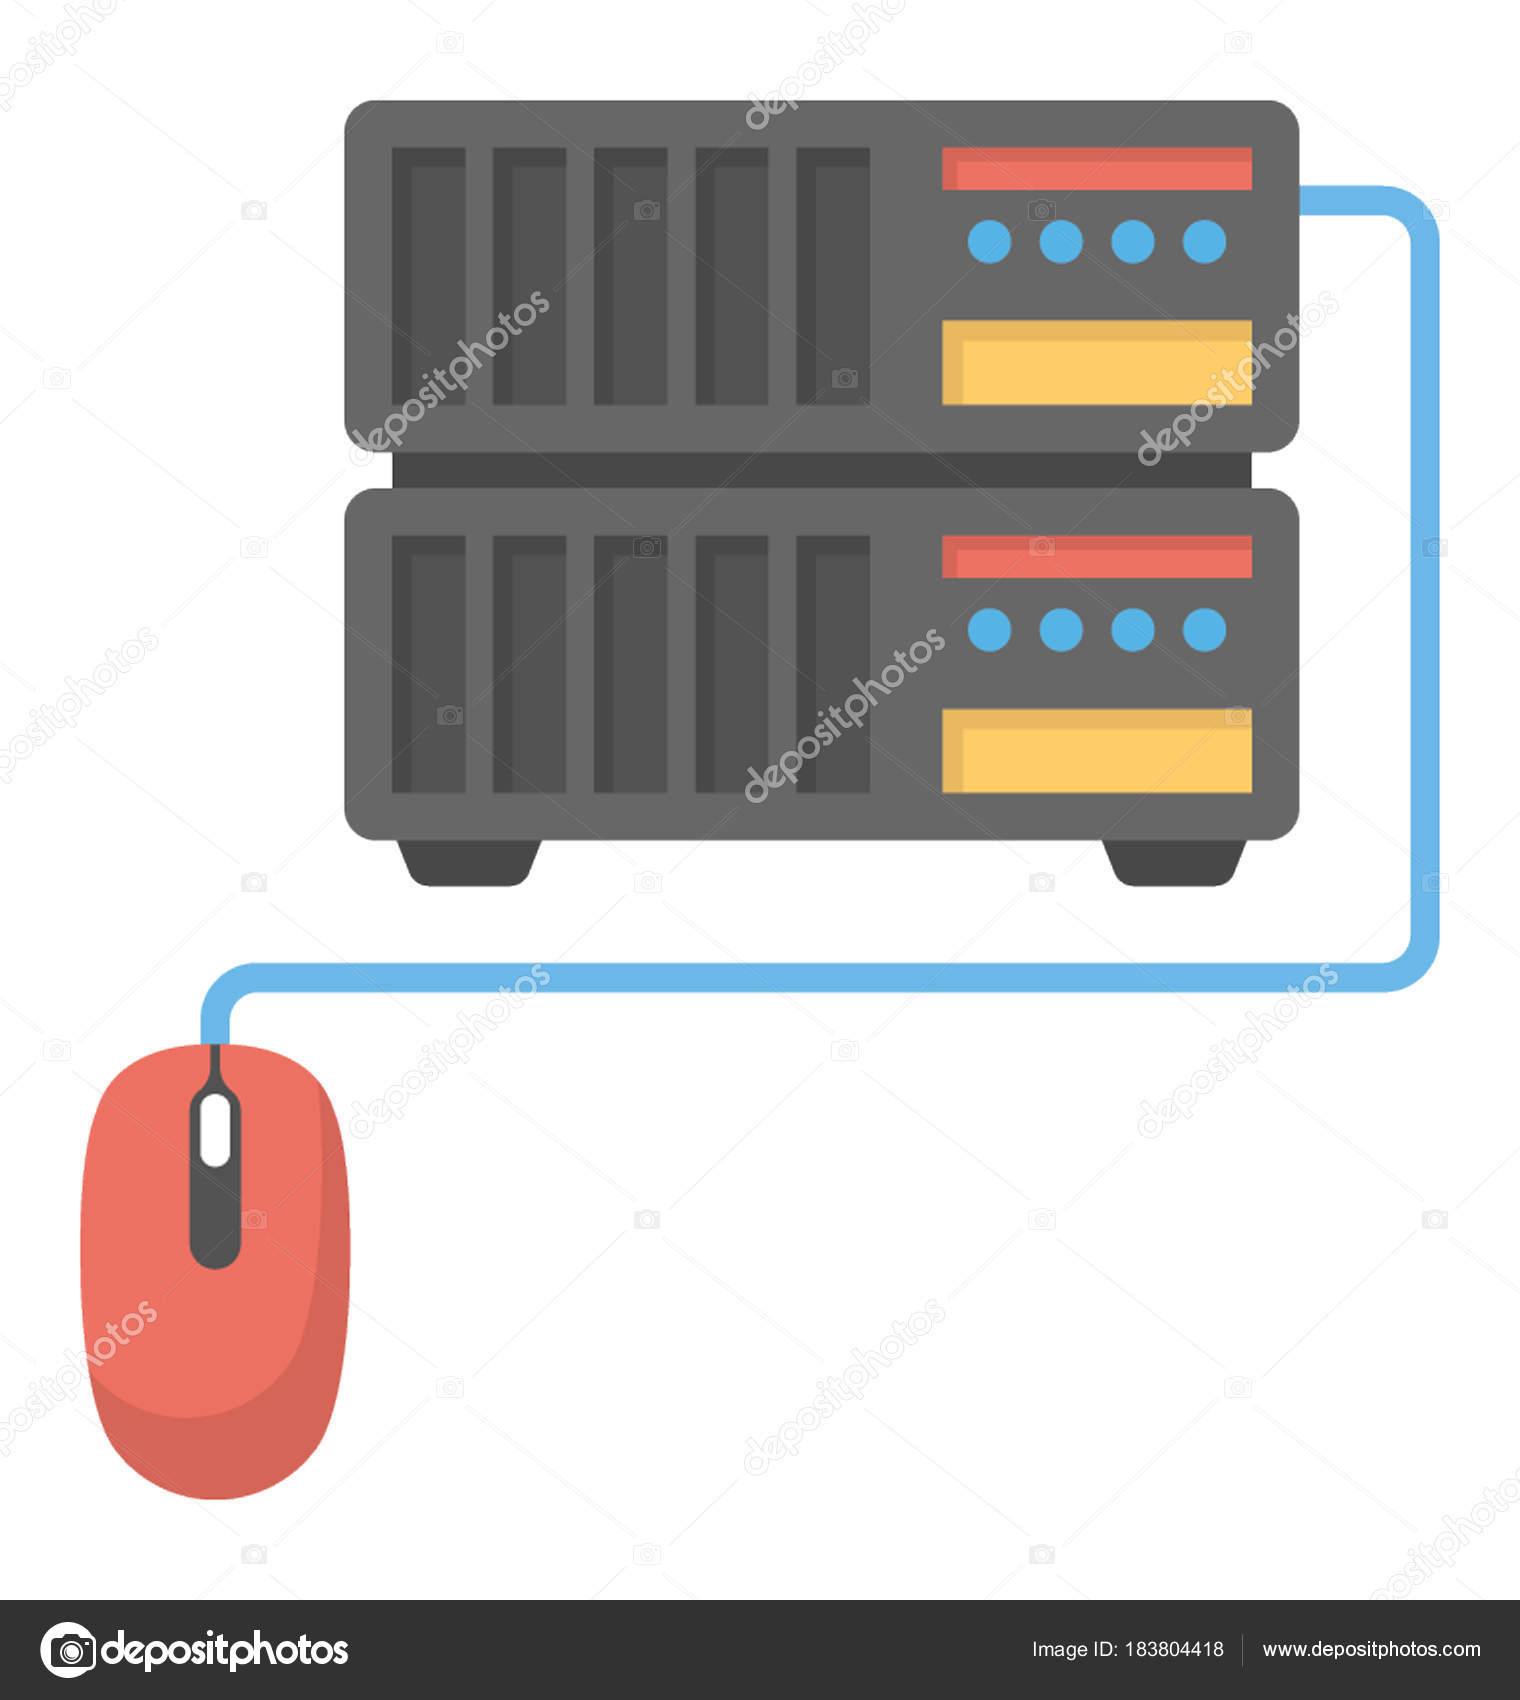 Wifi mouse server скачать